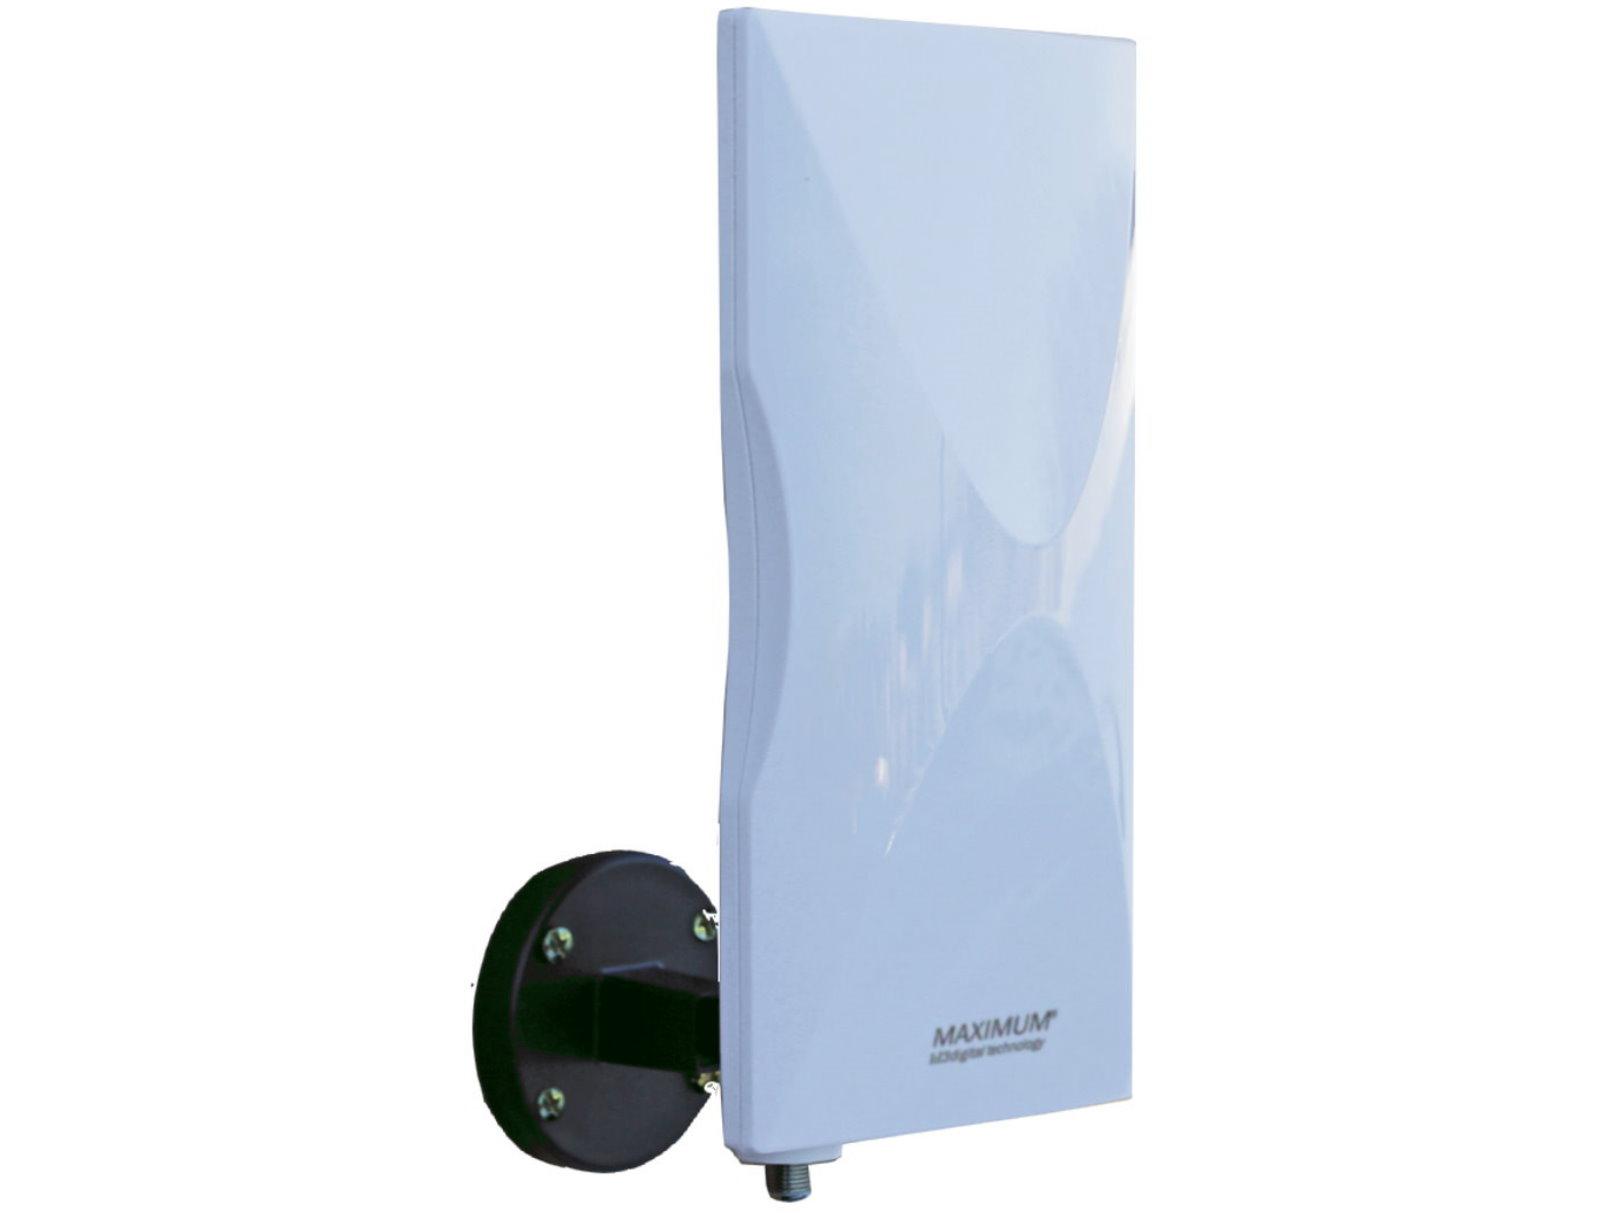 da6000 dvb t maximum au en antenne outdoor dab ukw tv dvbt. Black Bedroom Furniture Sets. Home Design Ideas